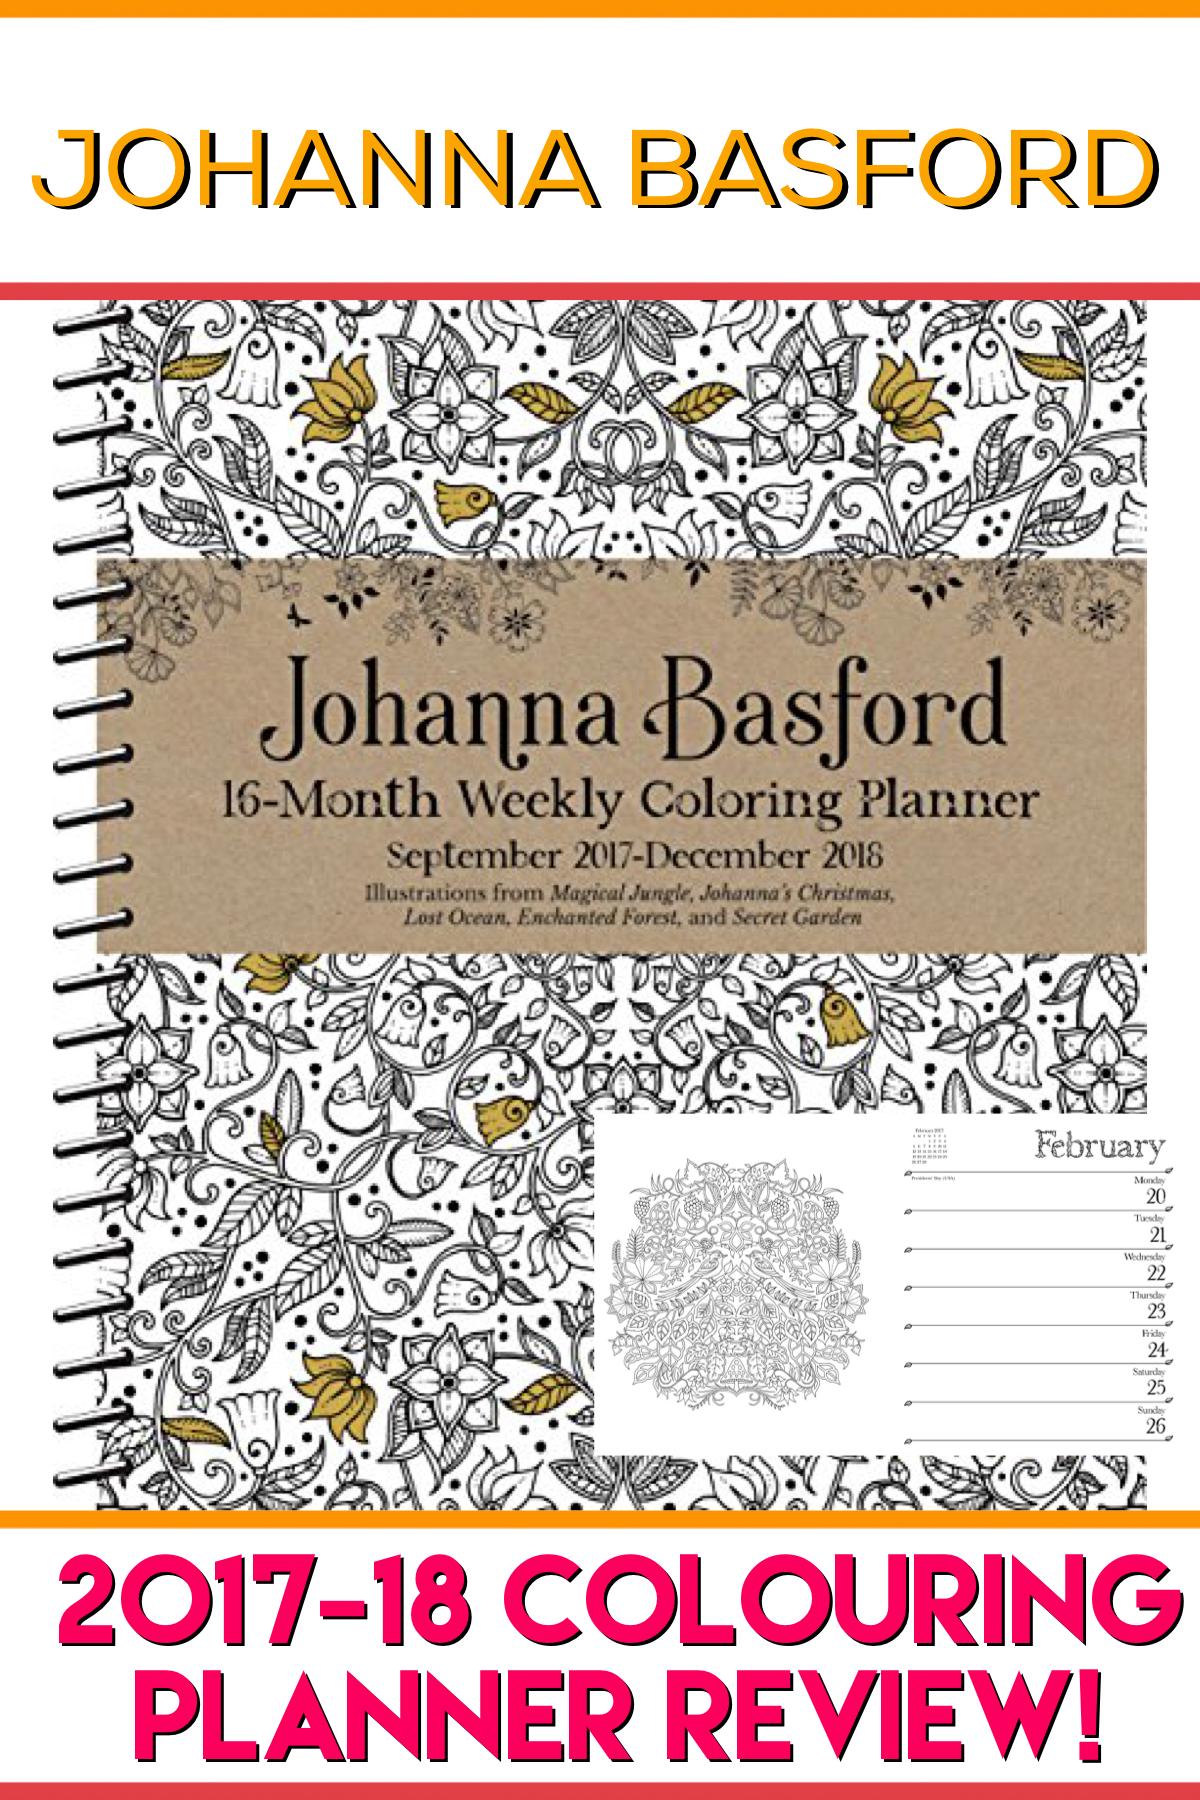 Coloring Books Johanna Basford Colouring Calendar 2017 2018 Book Review